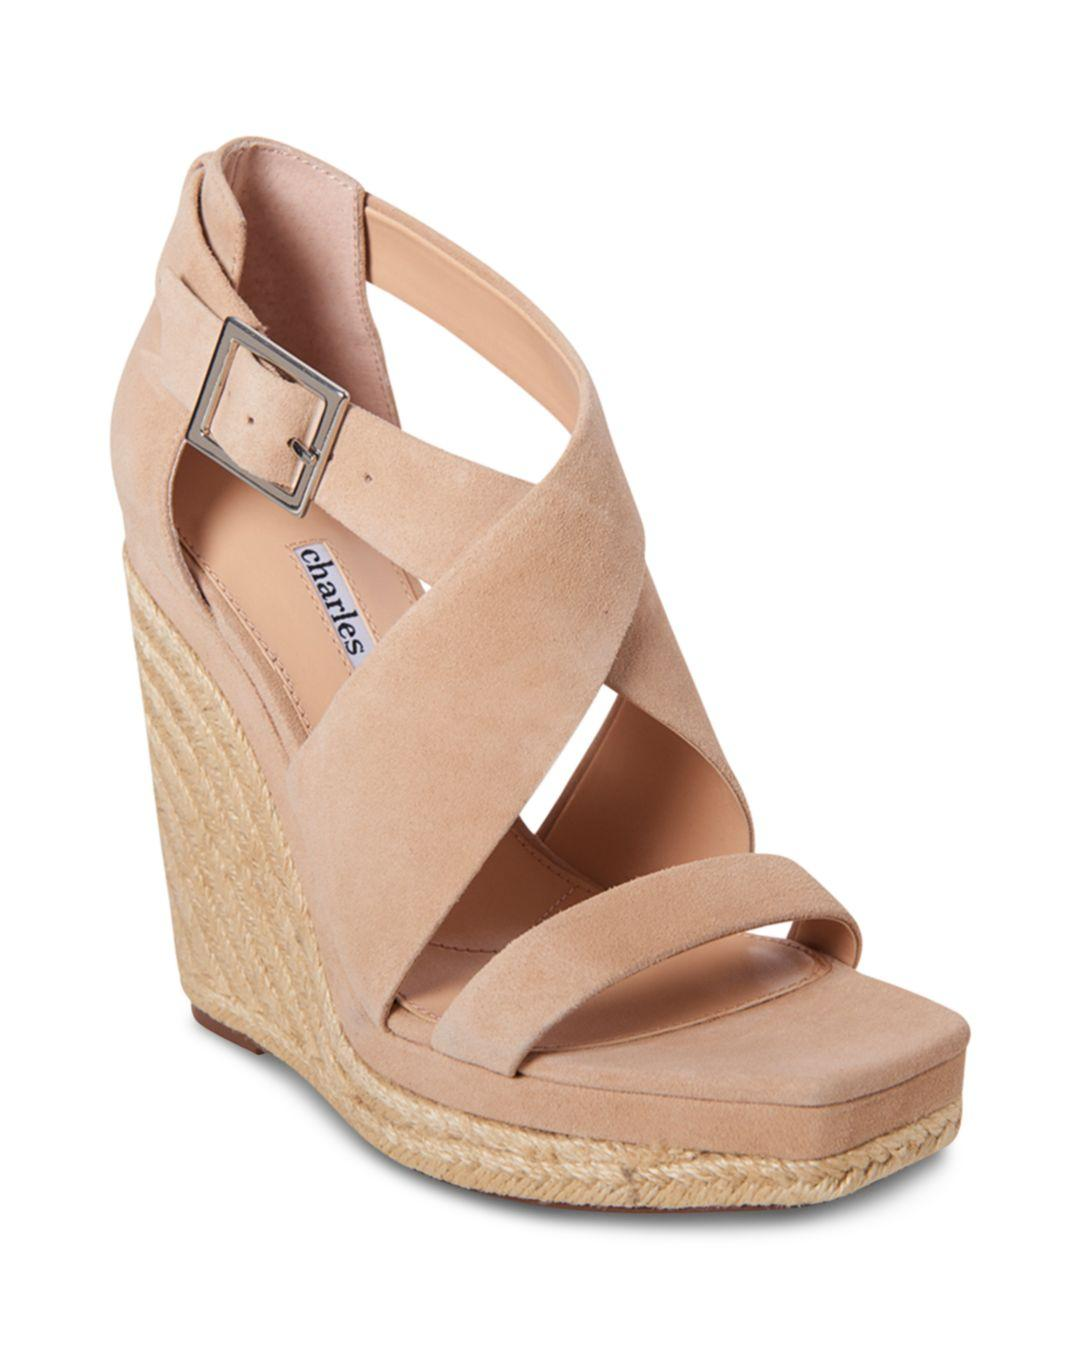 775cca2f48a Lyst - Charles David Women's Esper Wedge Sandals in Natural